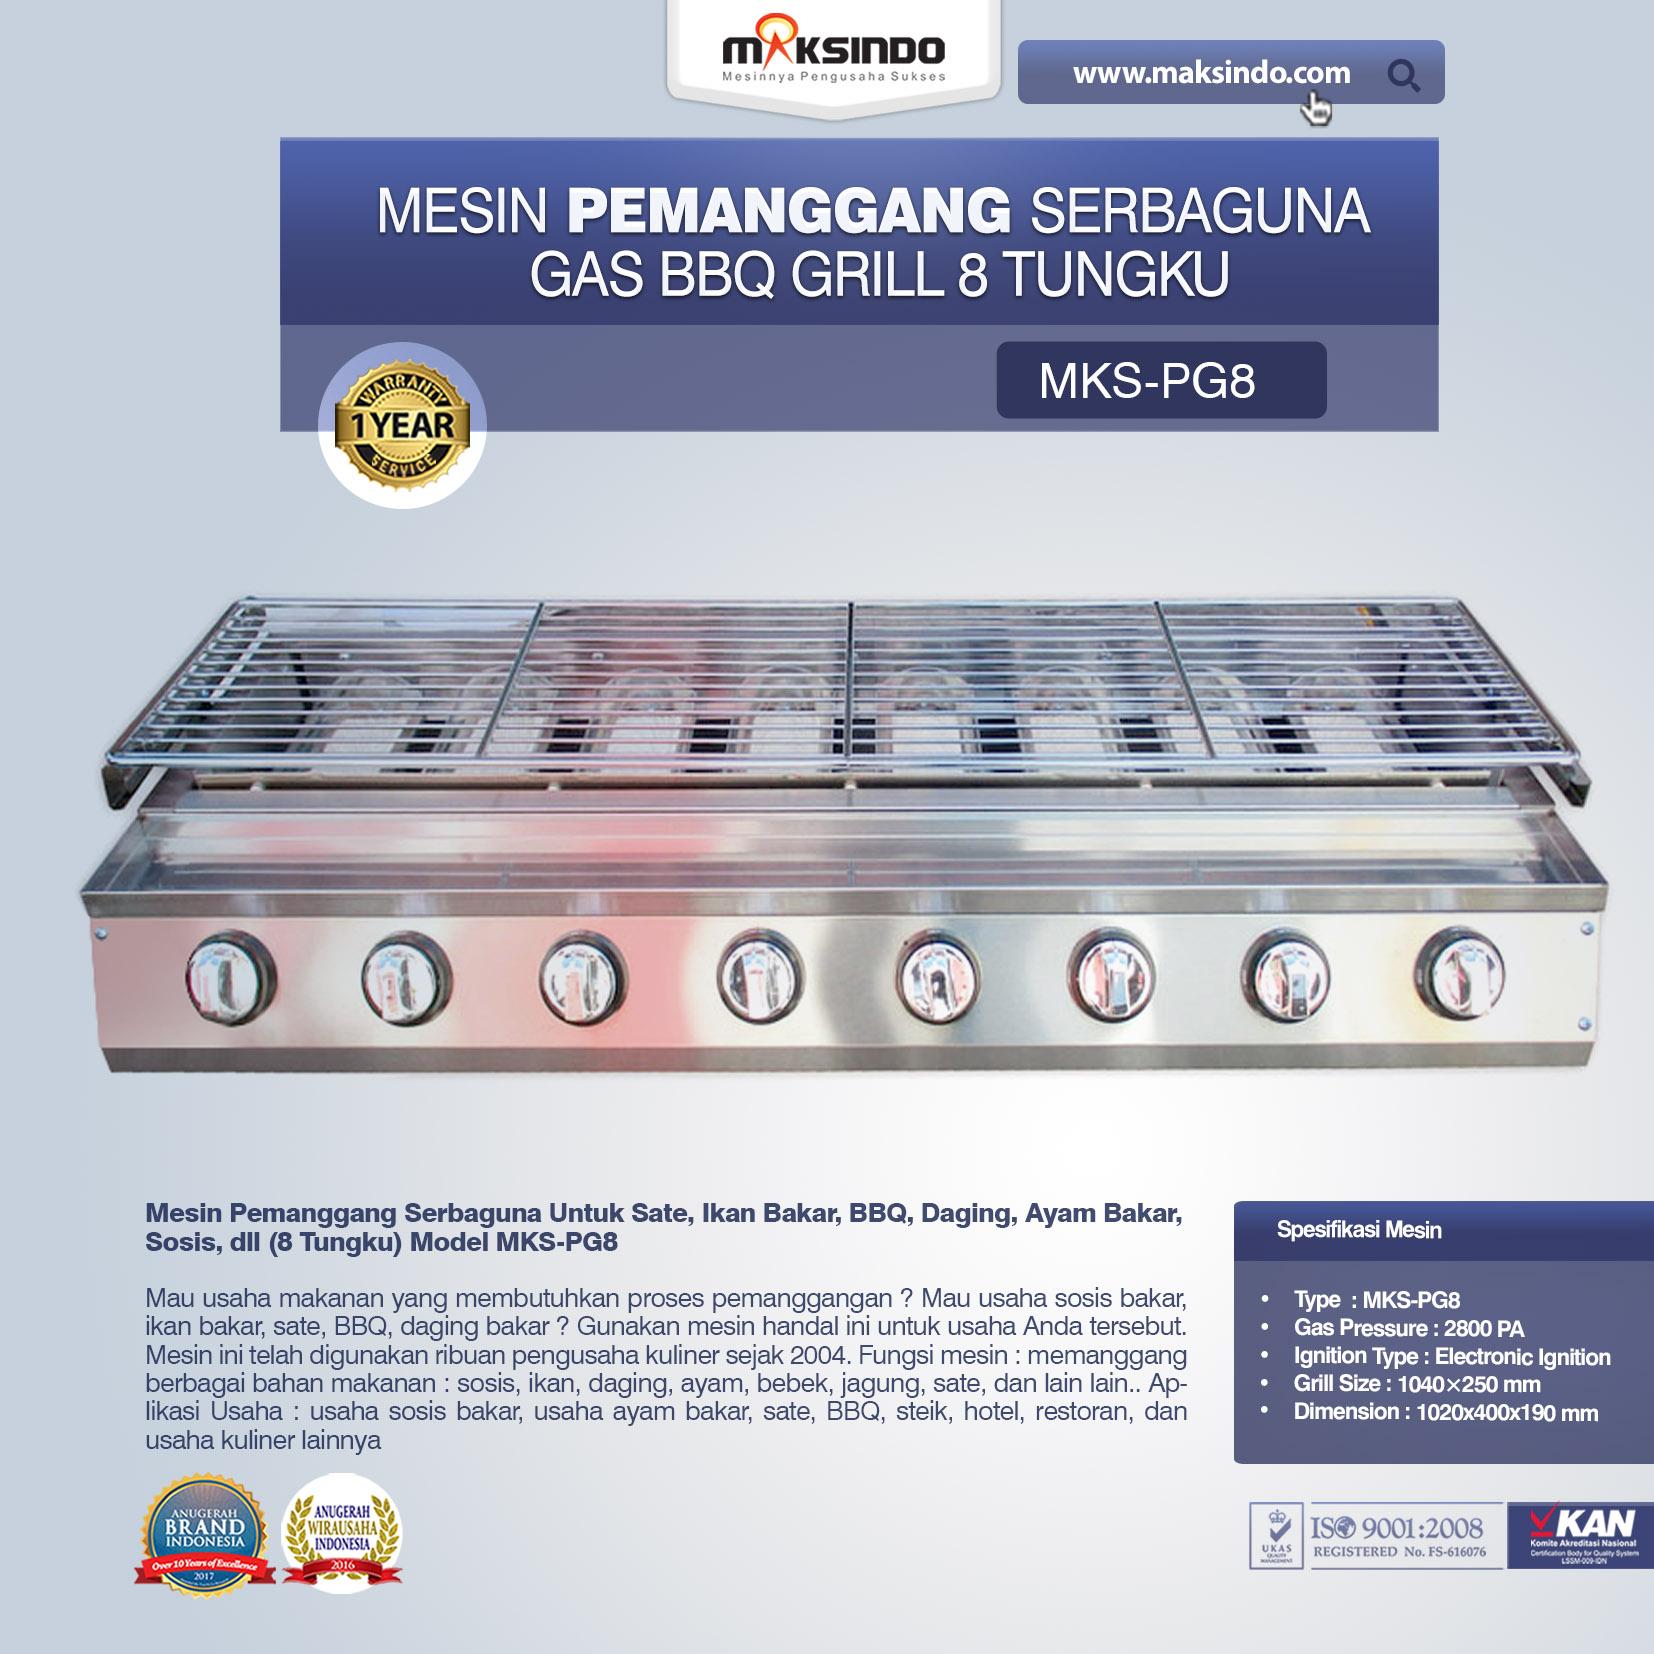 Jual Pemanggang Serbaguna Gas BBQ Grill 8 Tungku Di